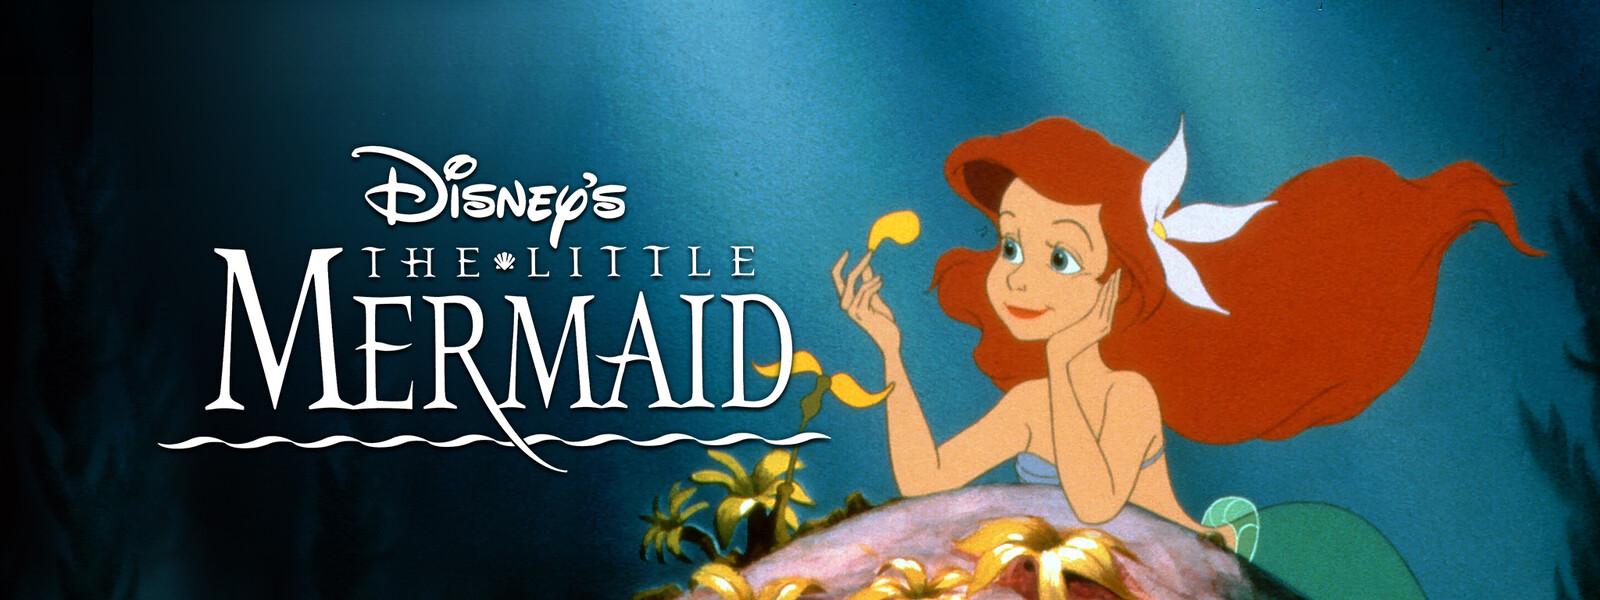 50024602 series art  768x2048 disneys the little mermaid c67ff74f400b5da1b76e2869696cdfed